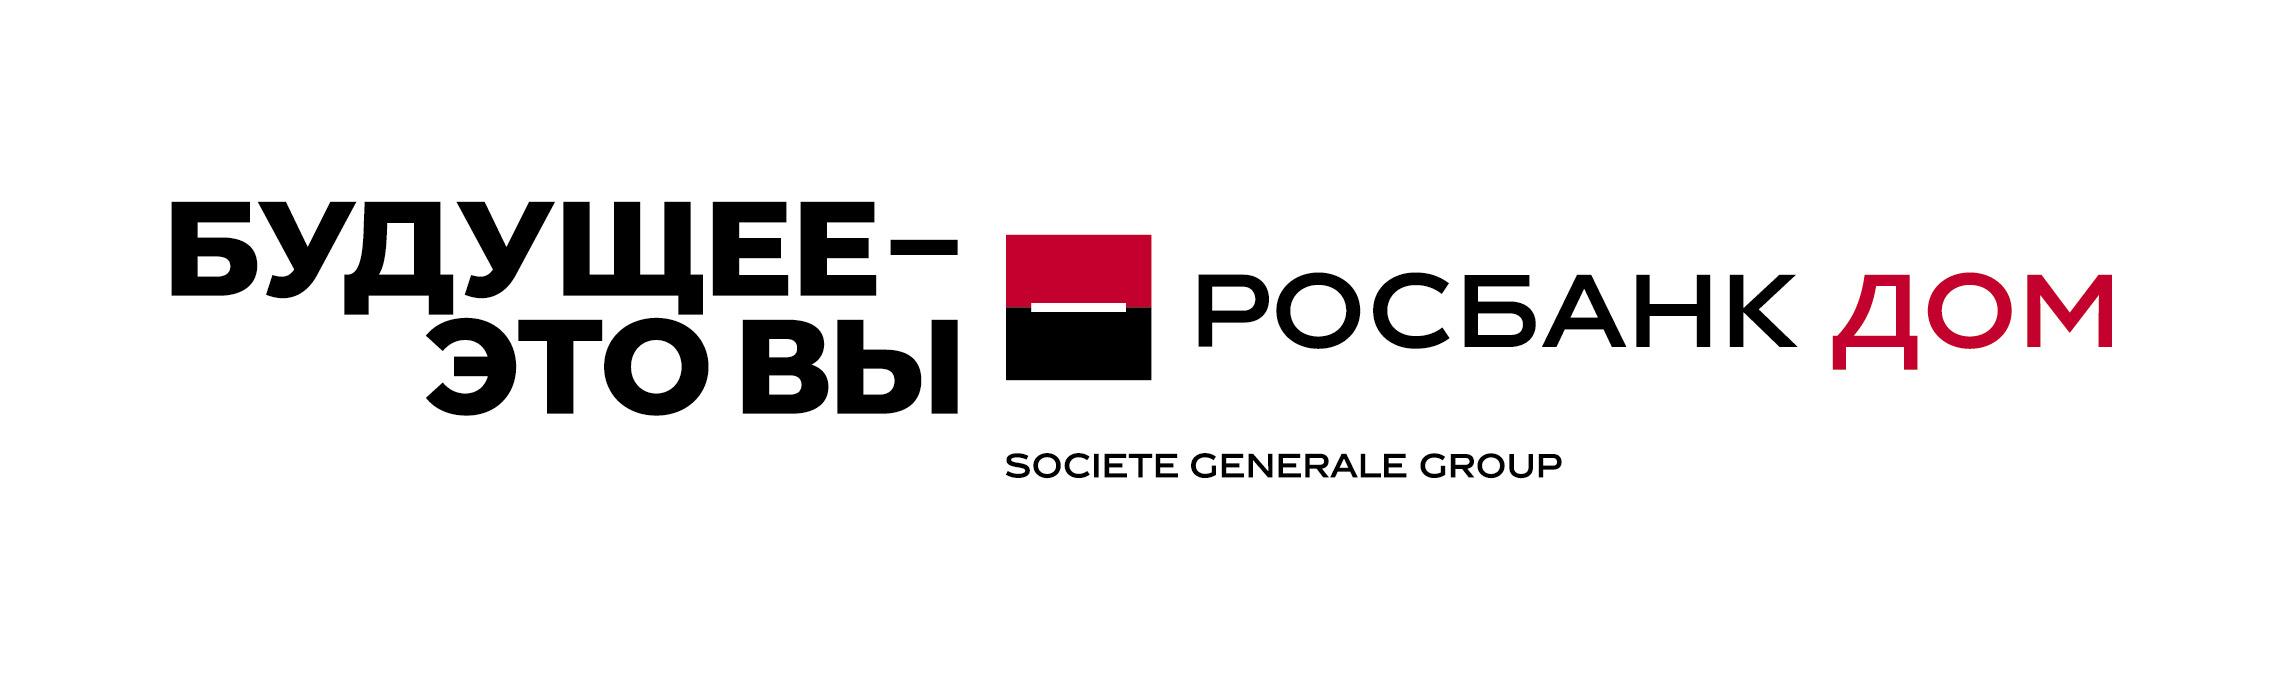 RB DOM logo